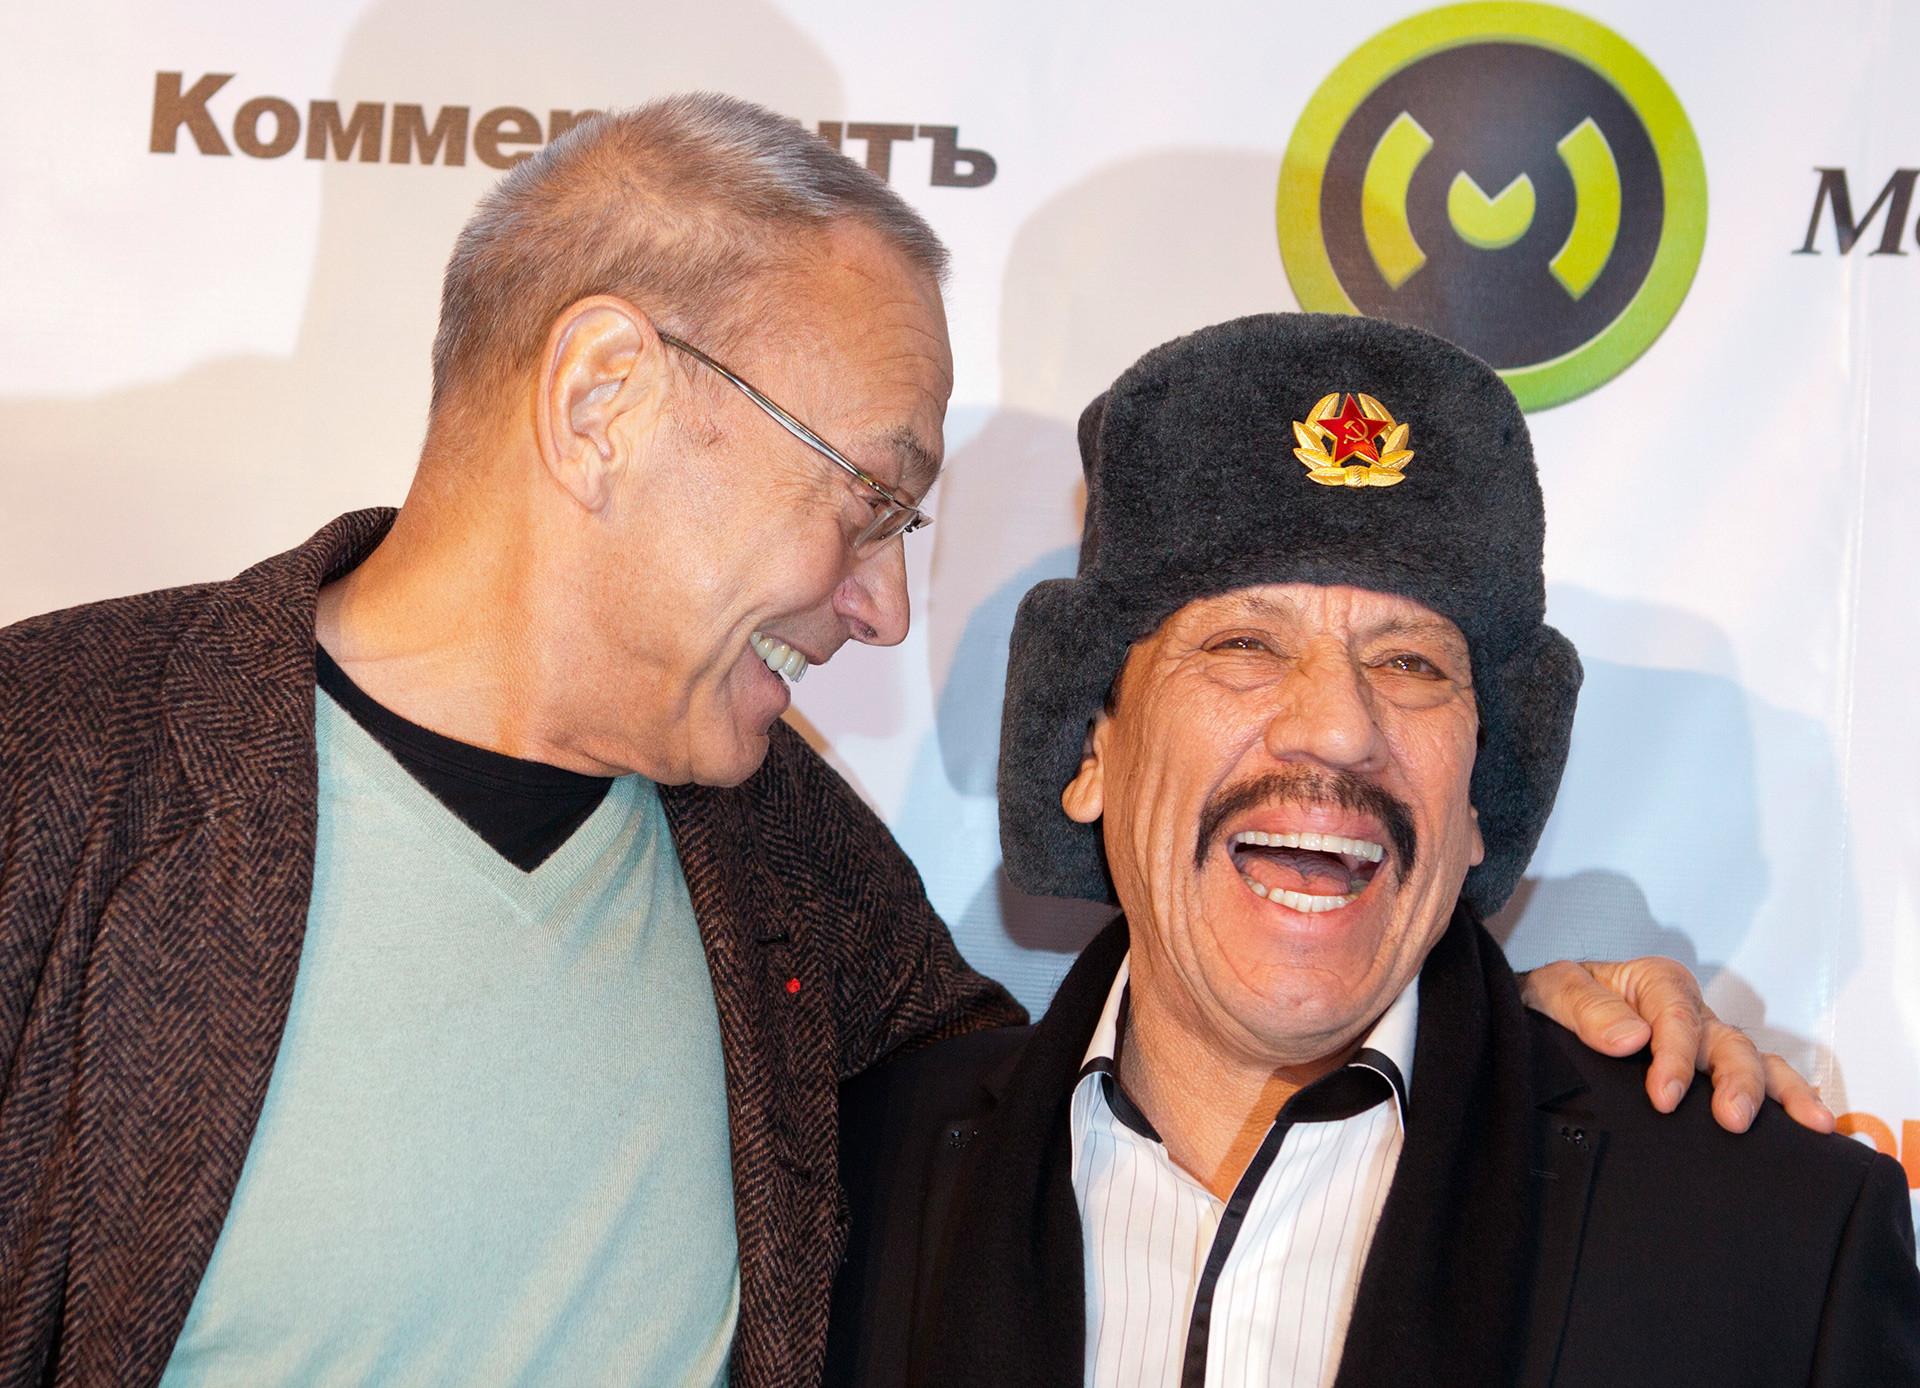 Andrei Konchalovsky (left) and Denny Trejo (right).